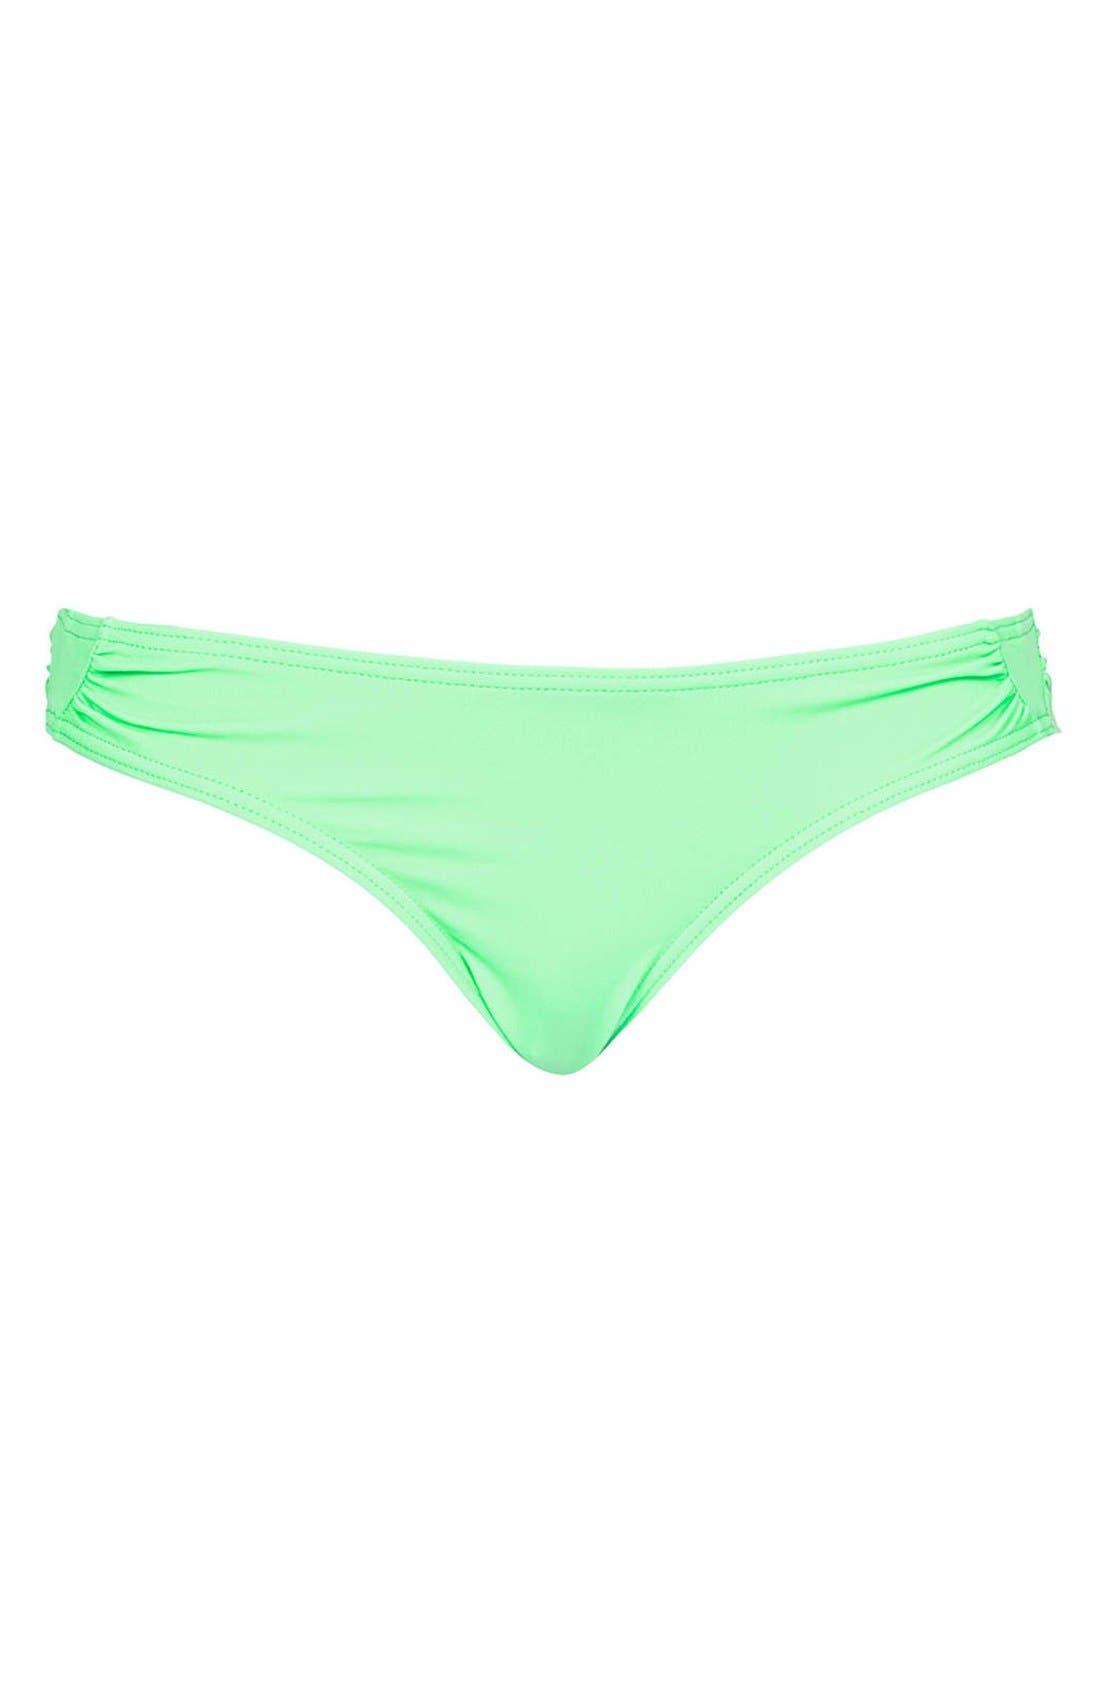 TOPSHOP 'Diamond' Side Ruched Bikini Bottoms, Main, color, 320